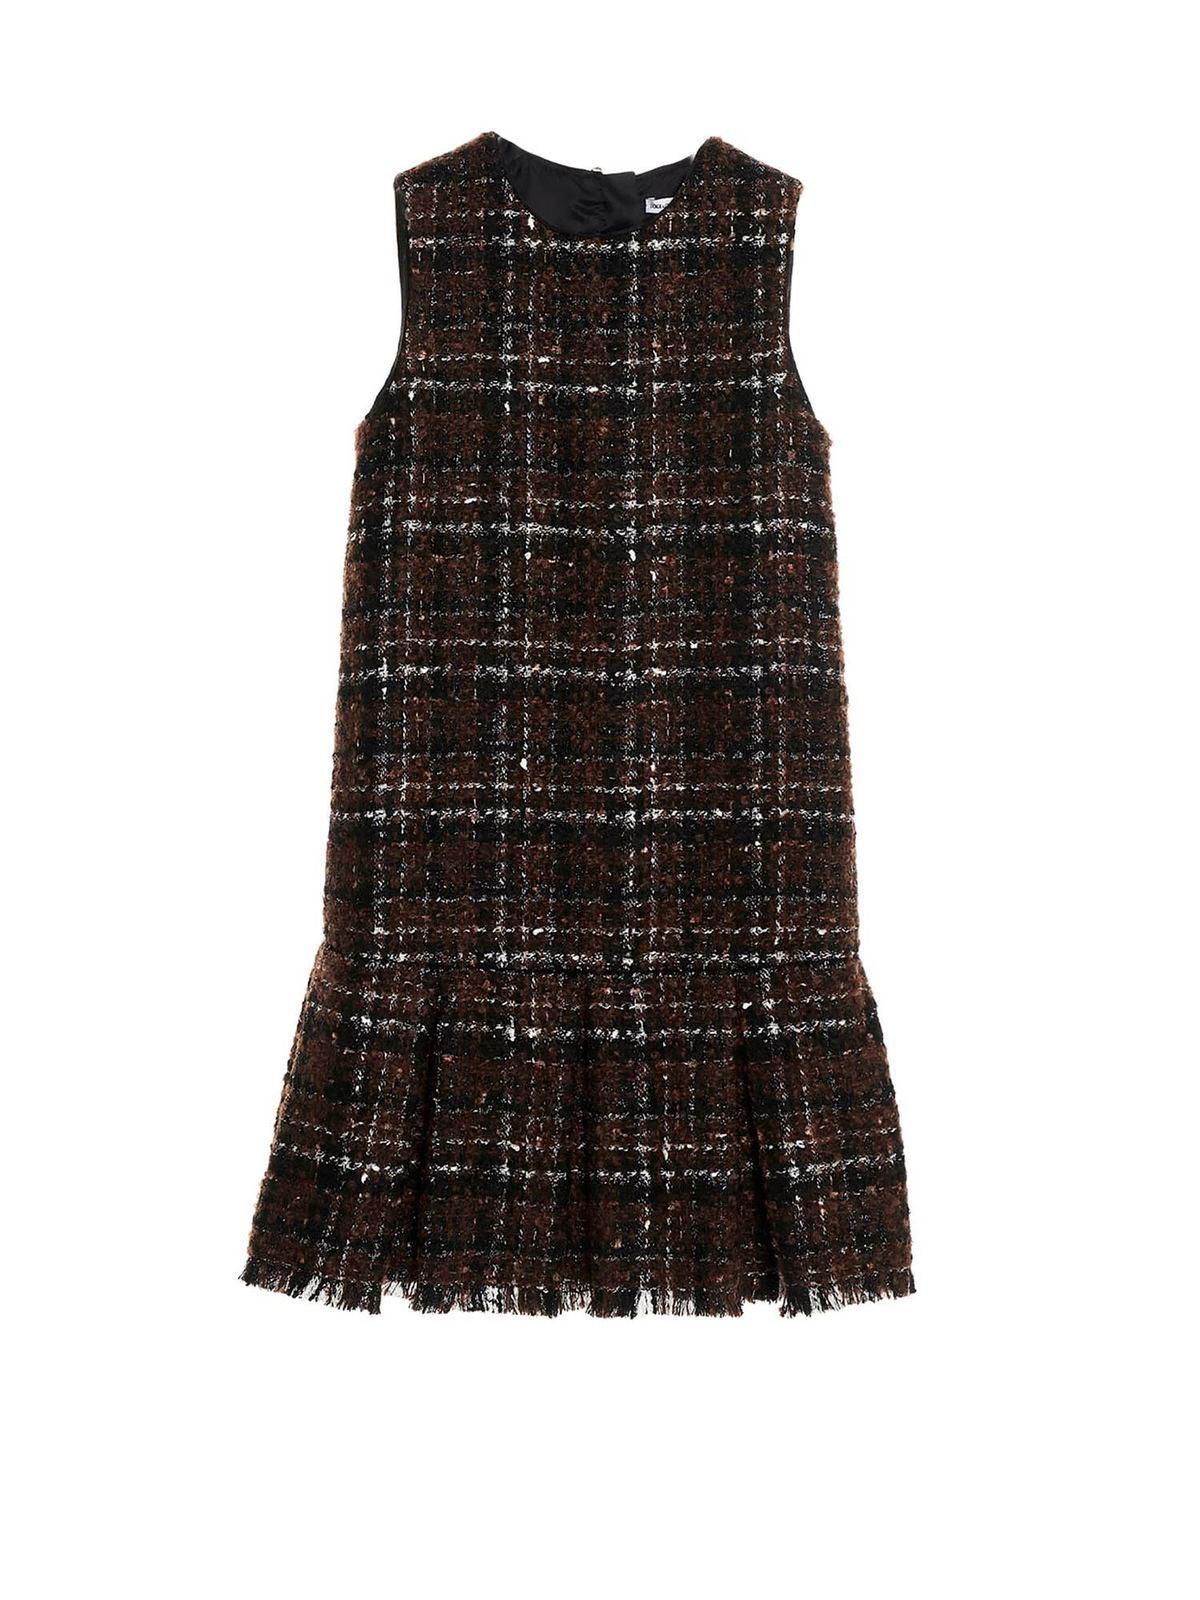 Dolce & Gabbana Jr Cottons LAME TWEED SHORT DRESS IN BROWN